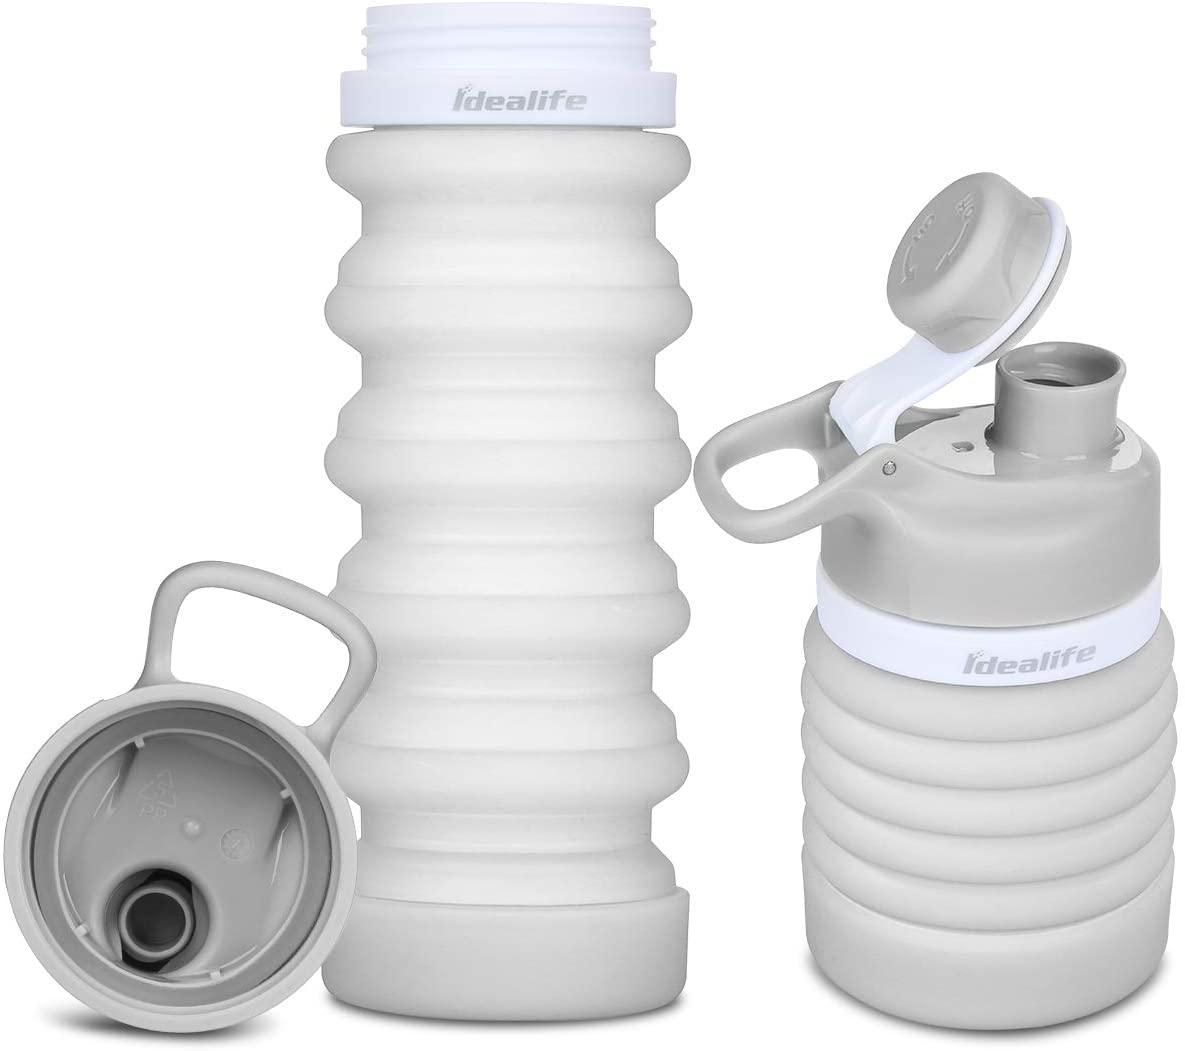 Idealife Collapsible Water Bottle BPA Free Food-grade Portable Silicone Leak Proof Safe Water Bottle for Women Men Kids, 18oz 550ml